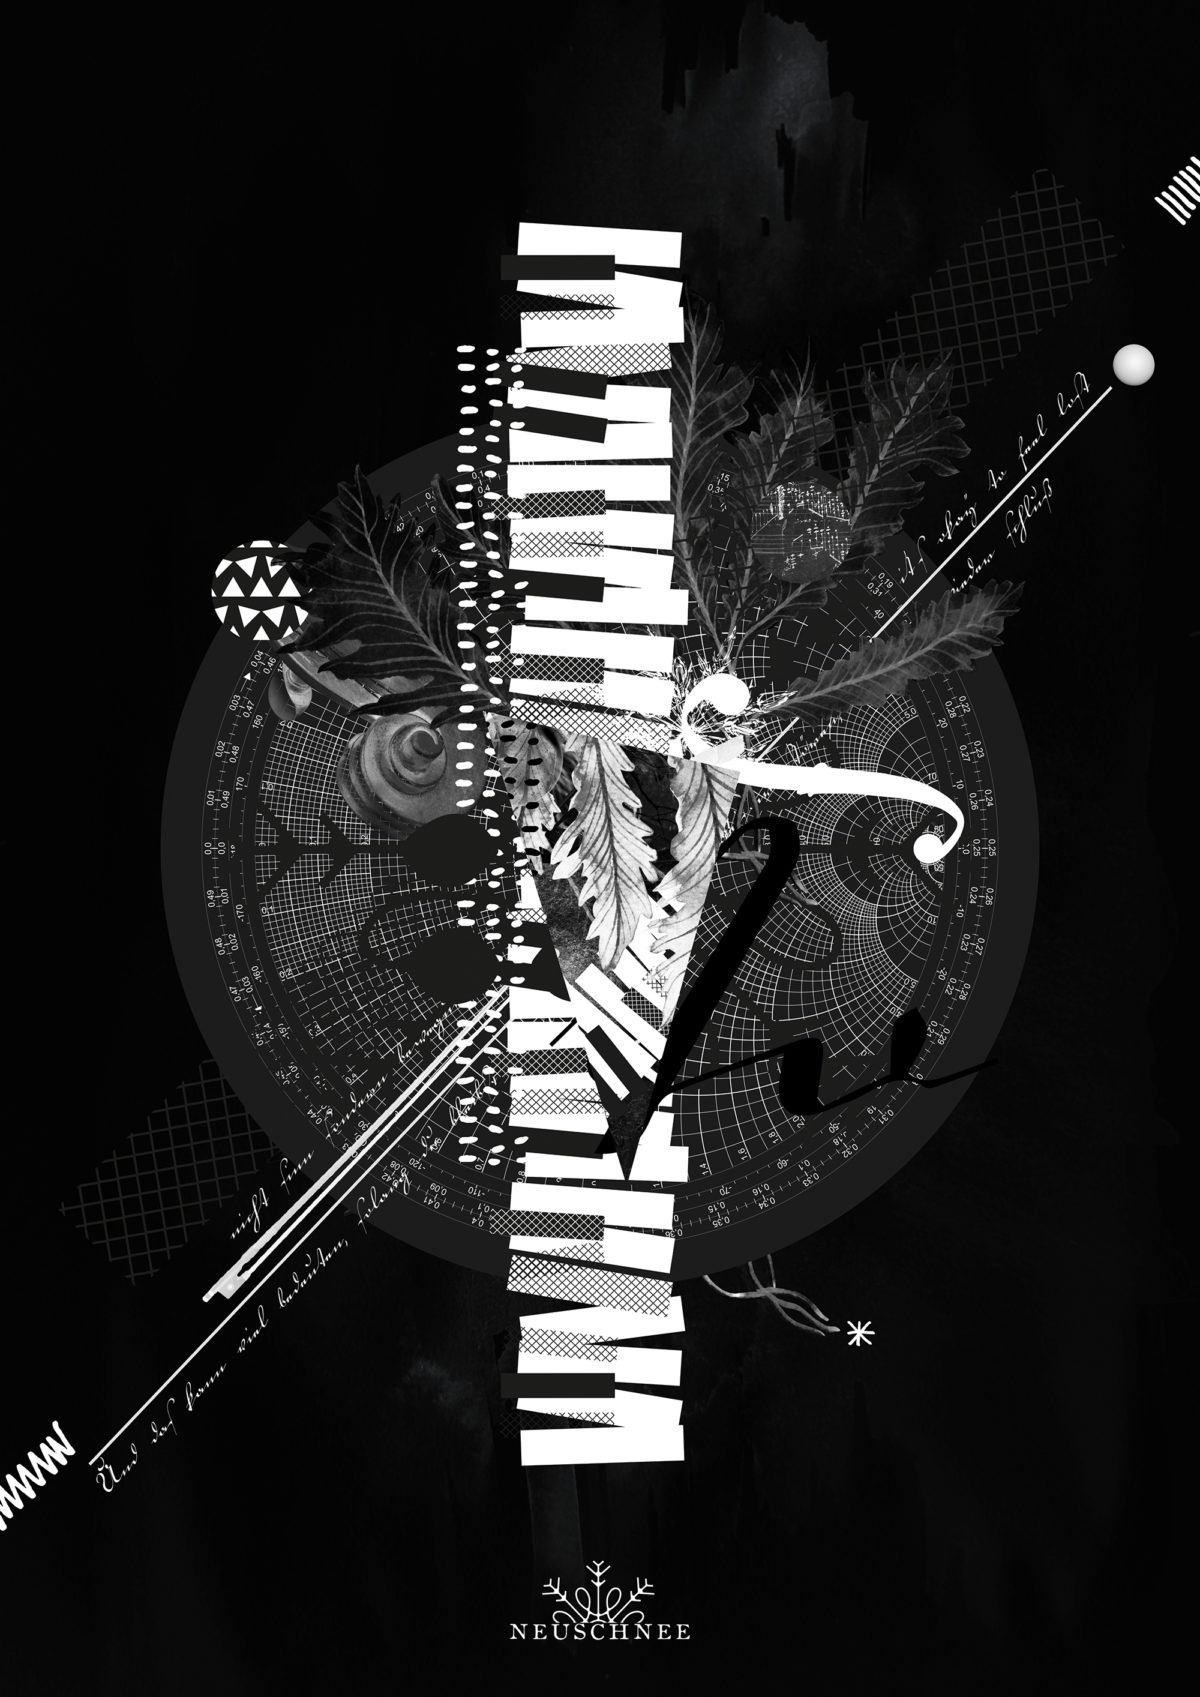 neuschnee_artwork_02